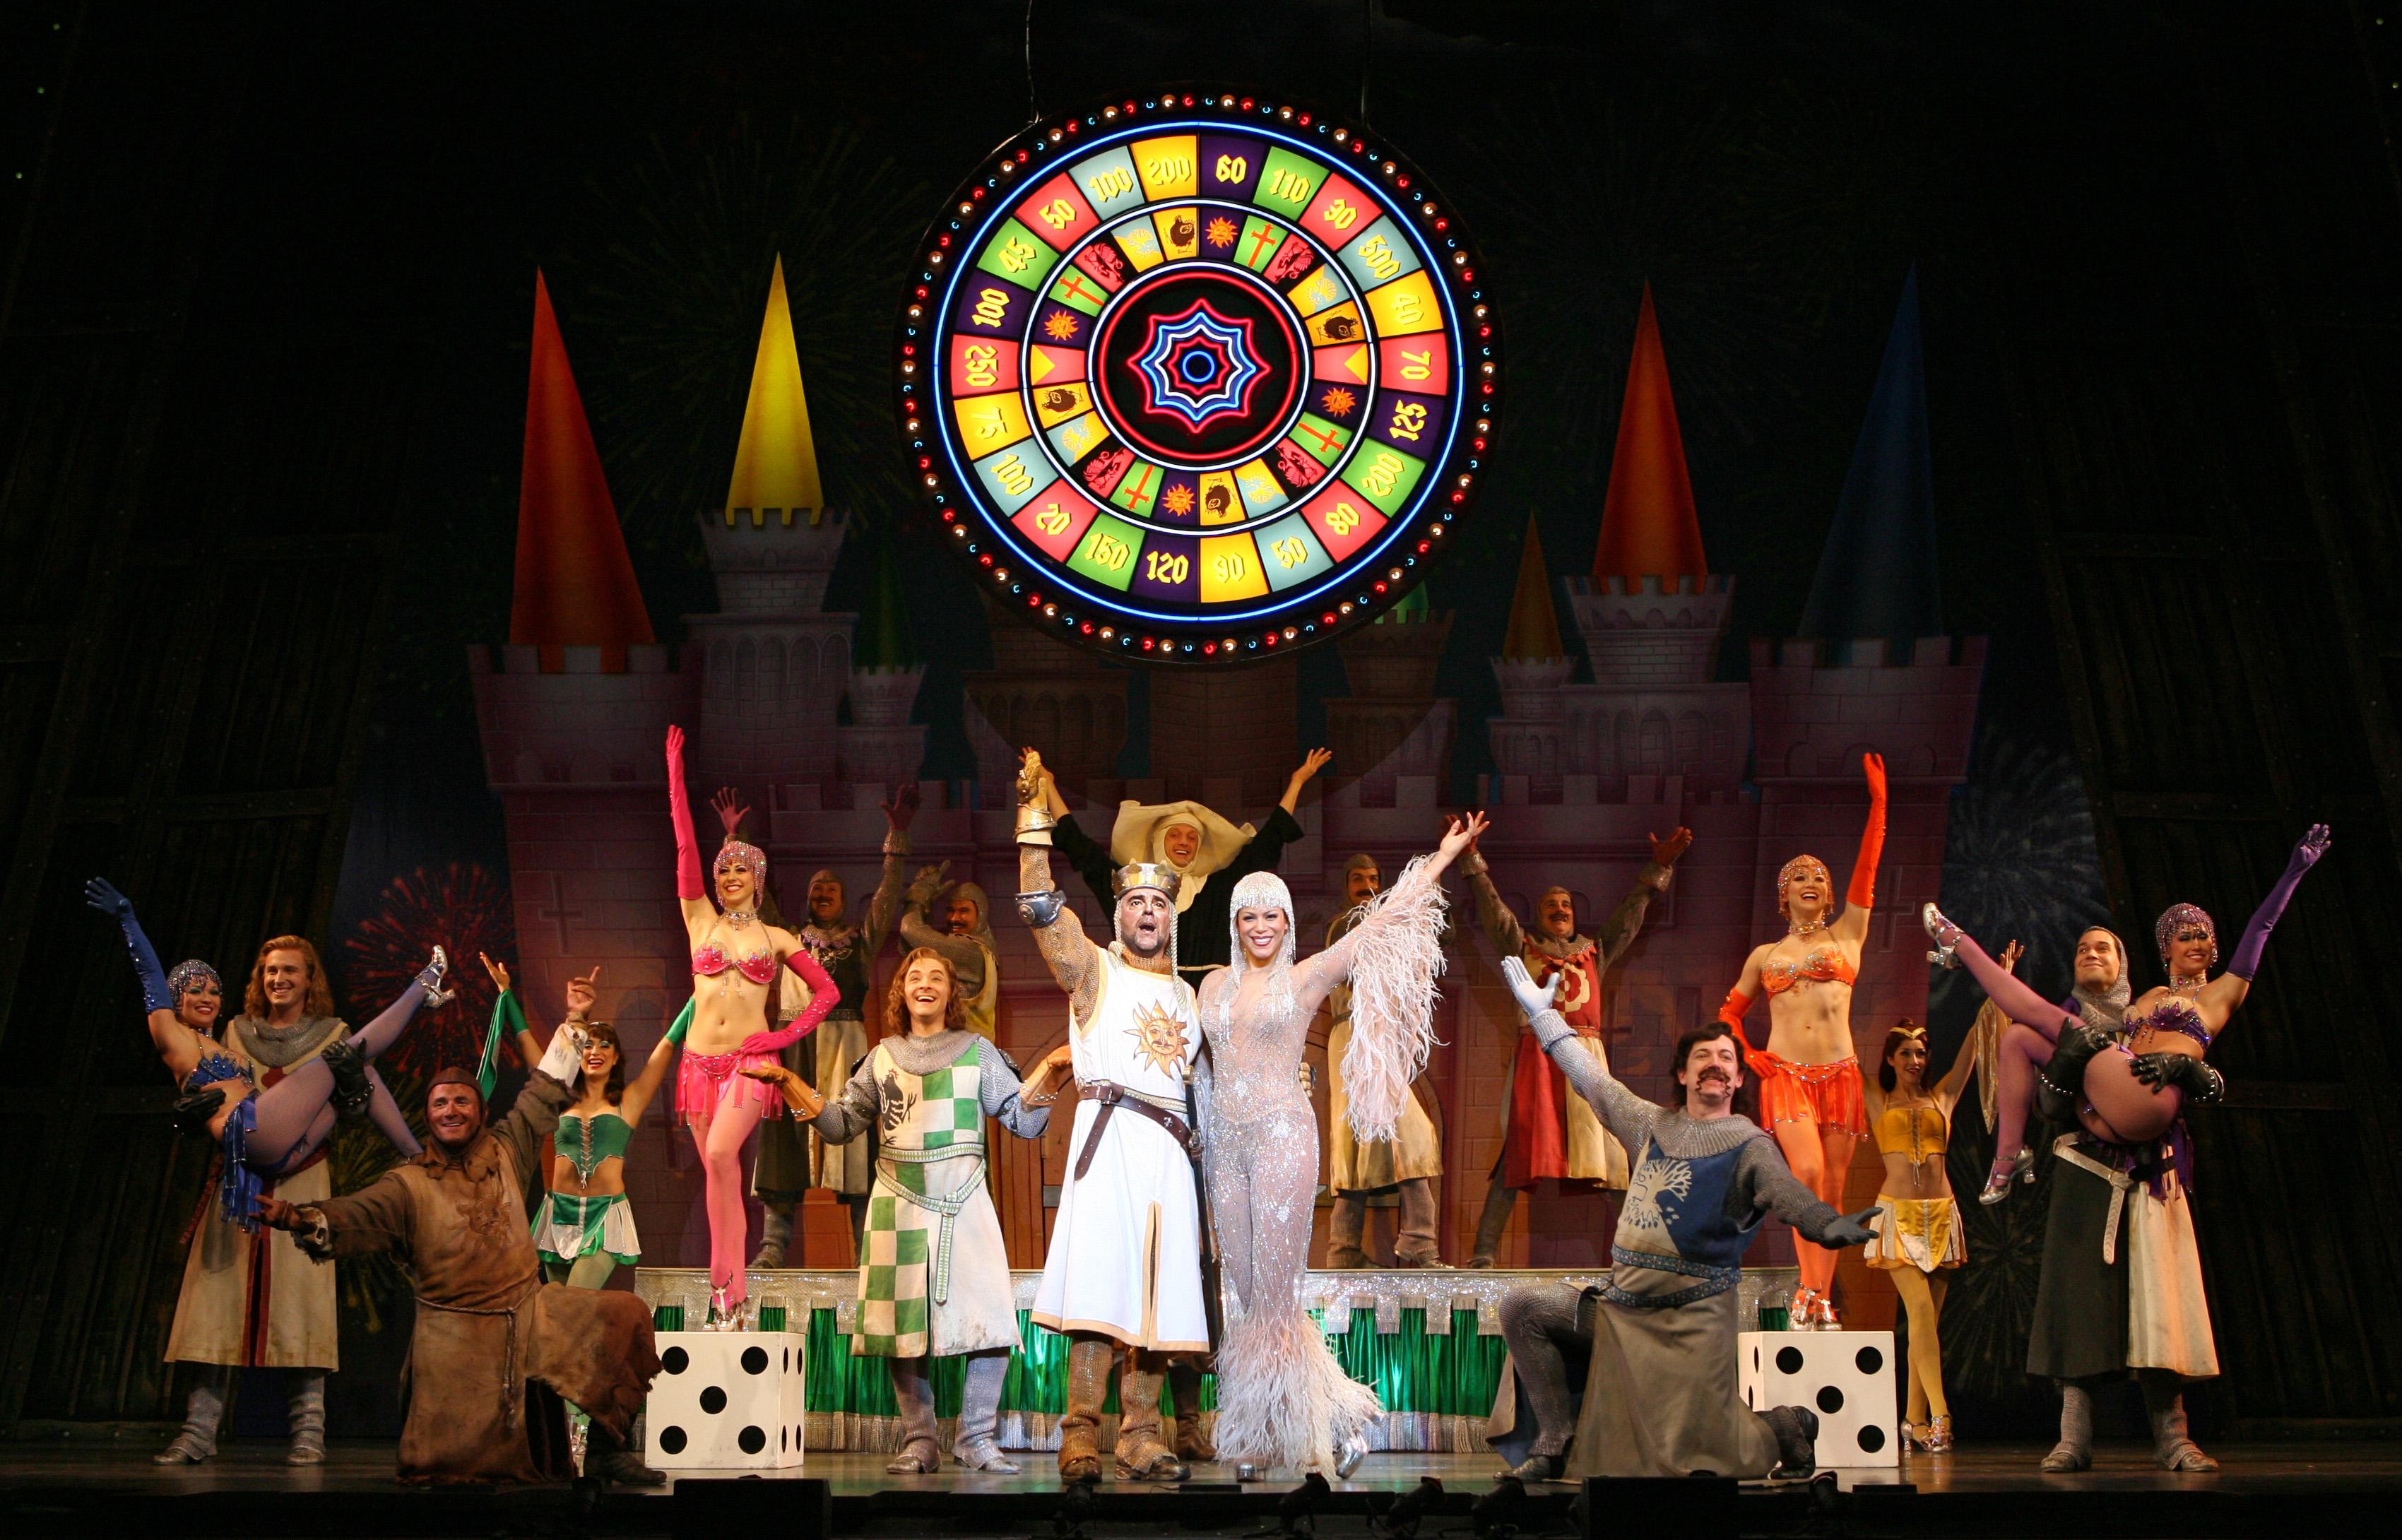 Monty Python S Spamalot Opens The Ocpac 2009 2010 Broadway